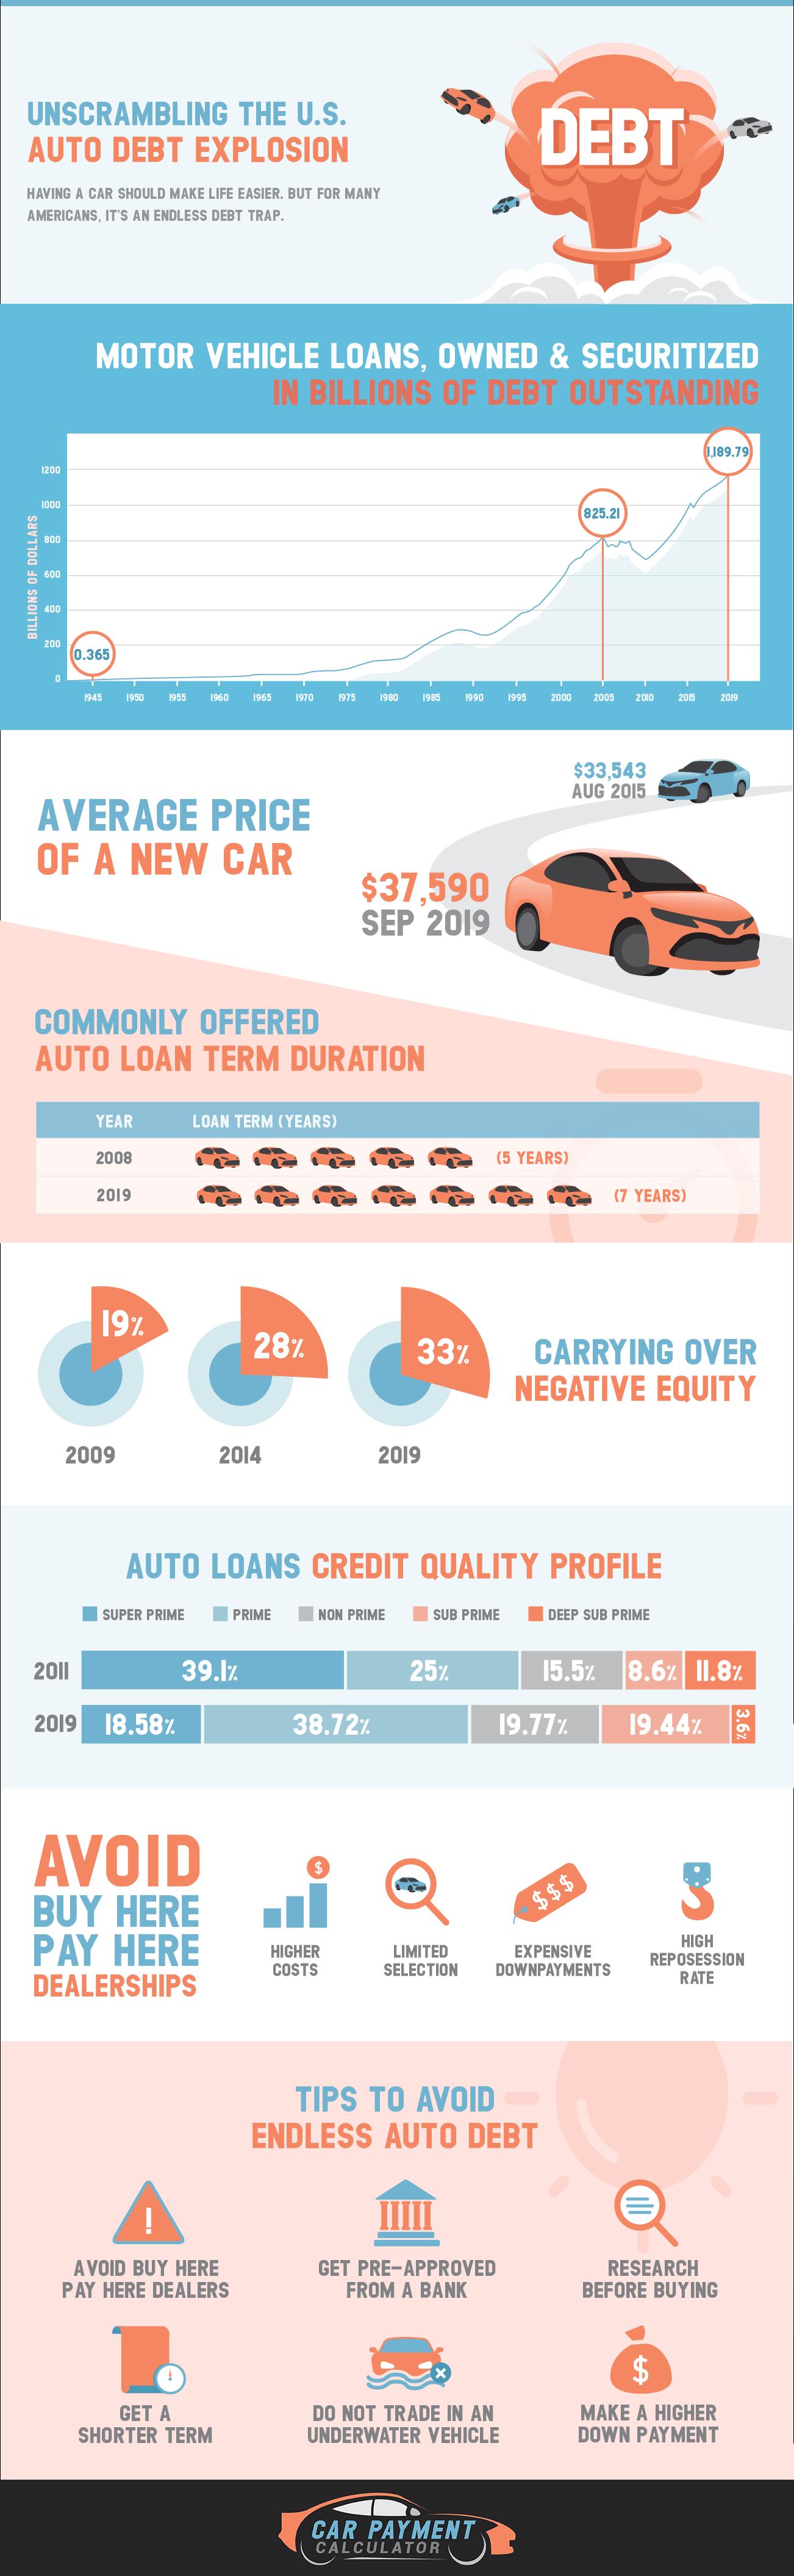 Unscrambling the U.S Auto Debt Explosion #infographic